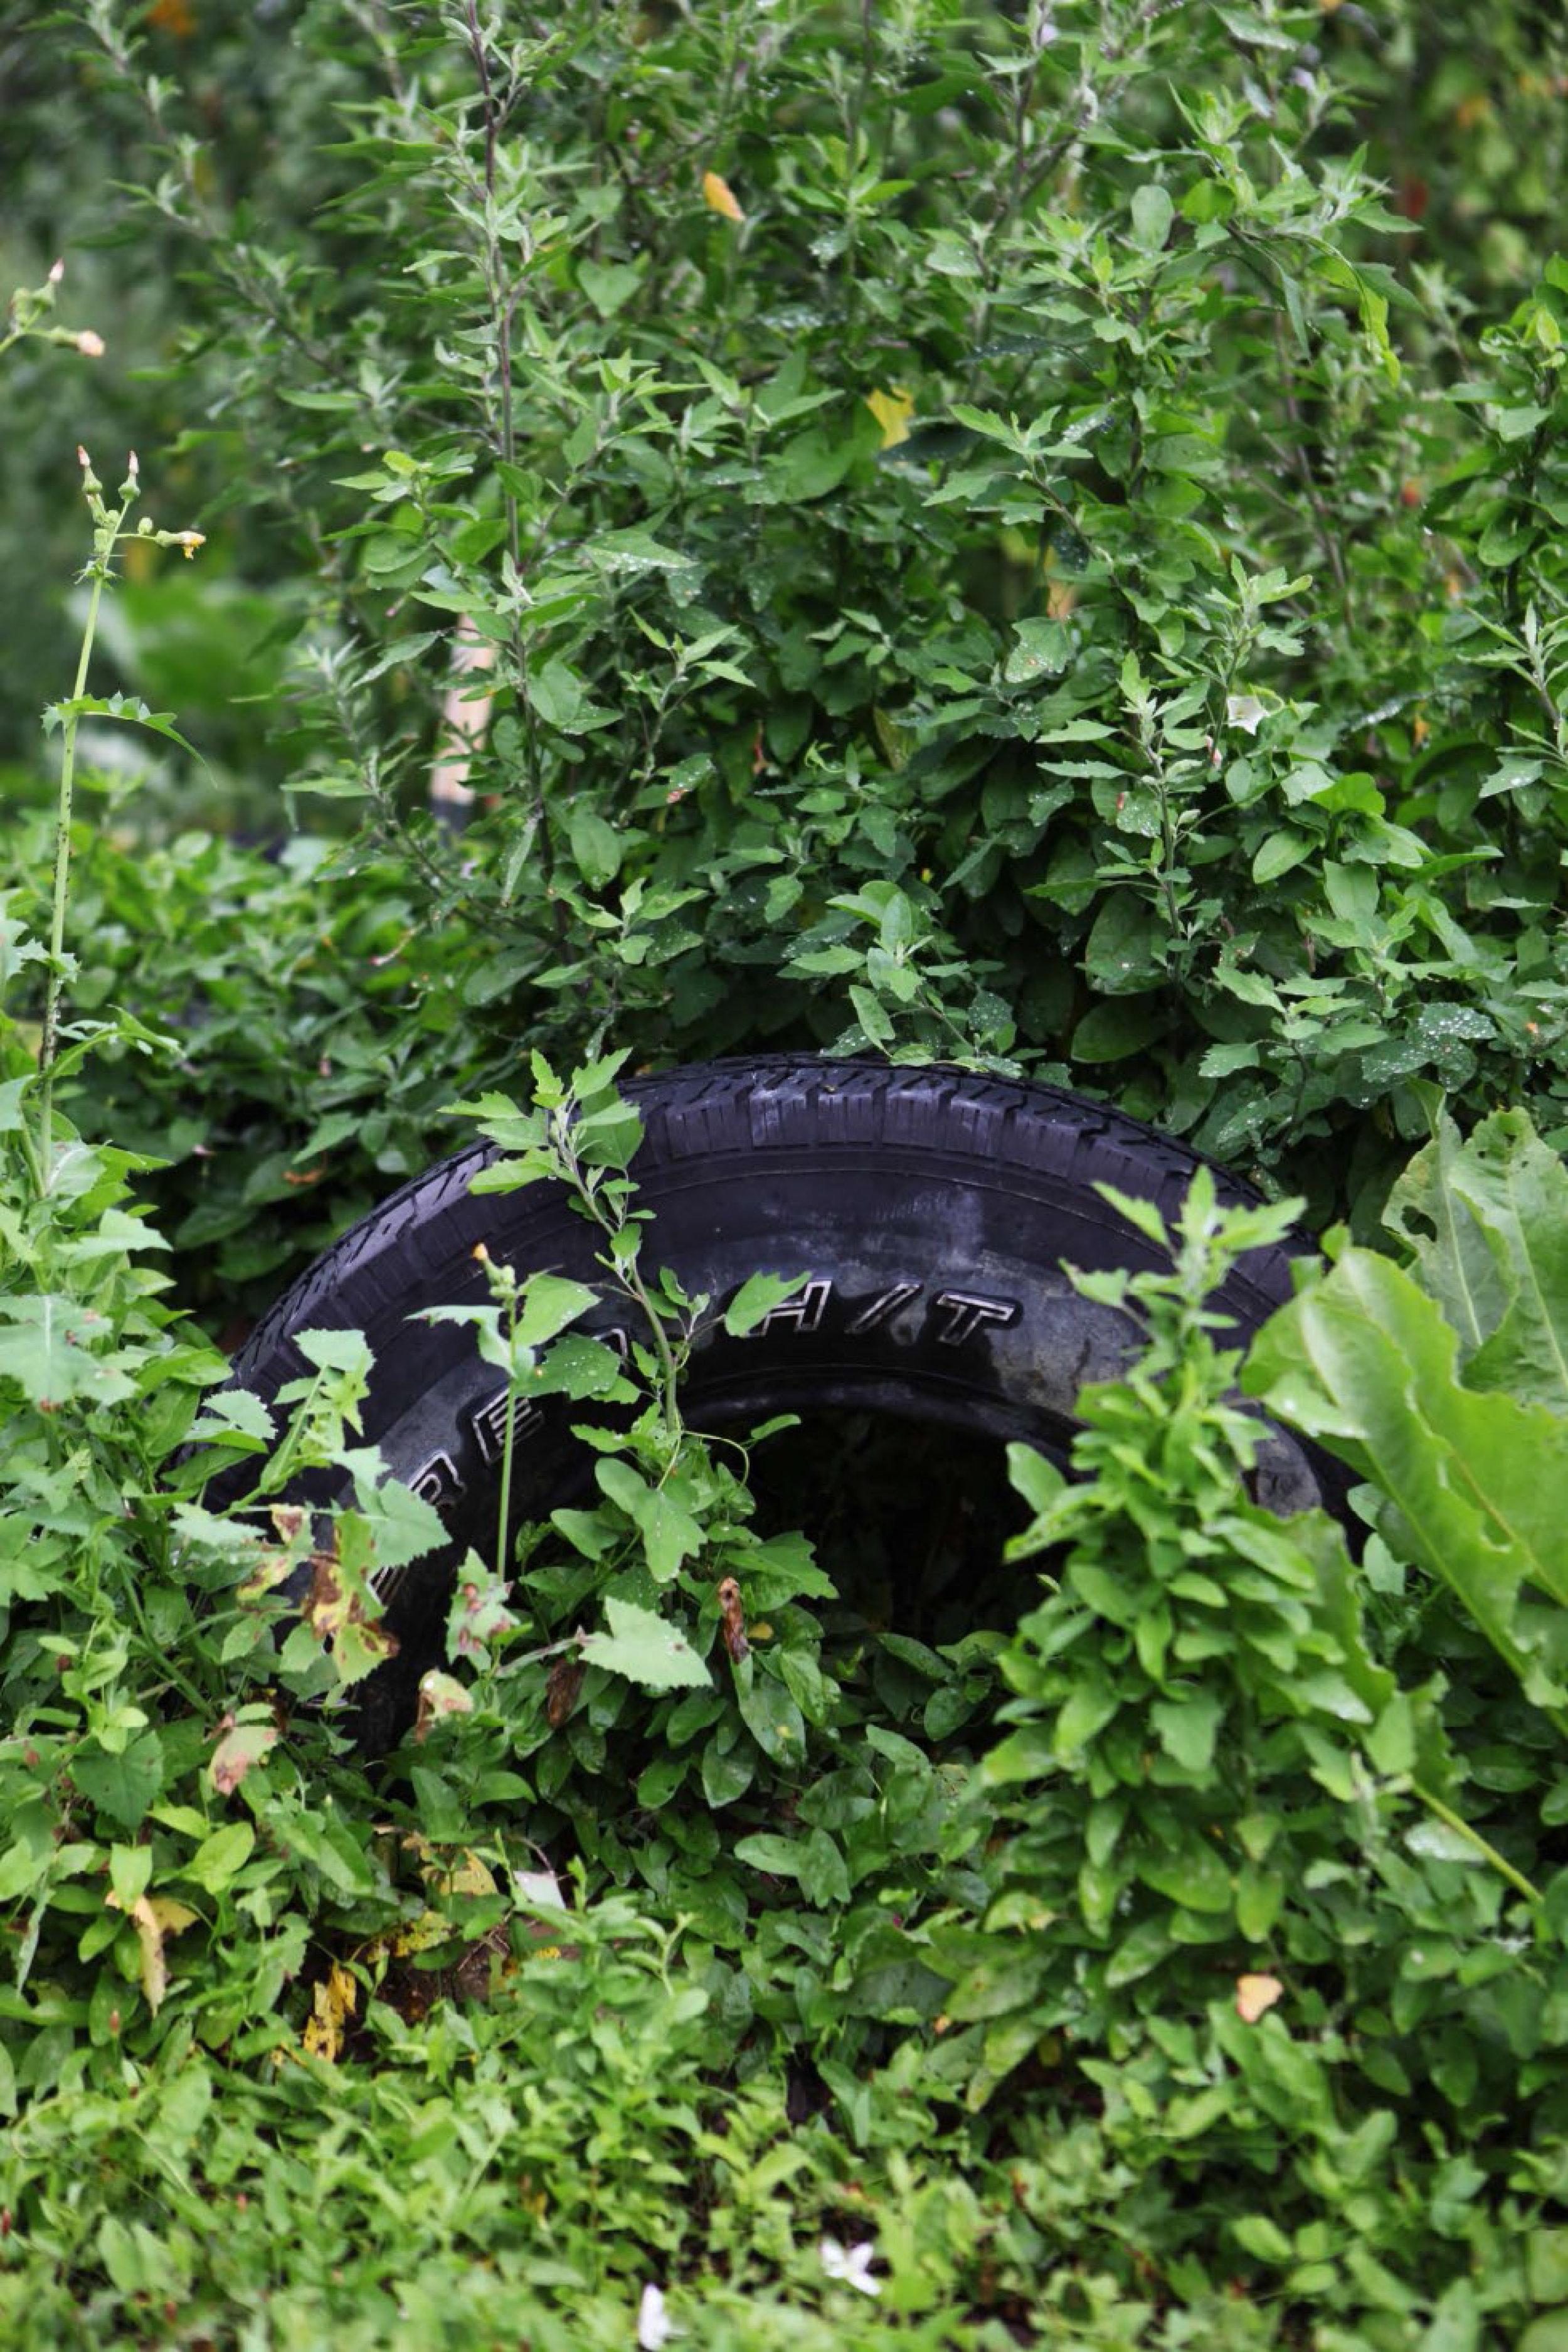 Tire in a Community Farm, Detroit